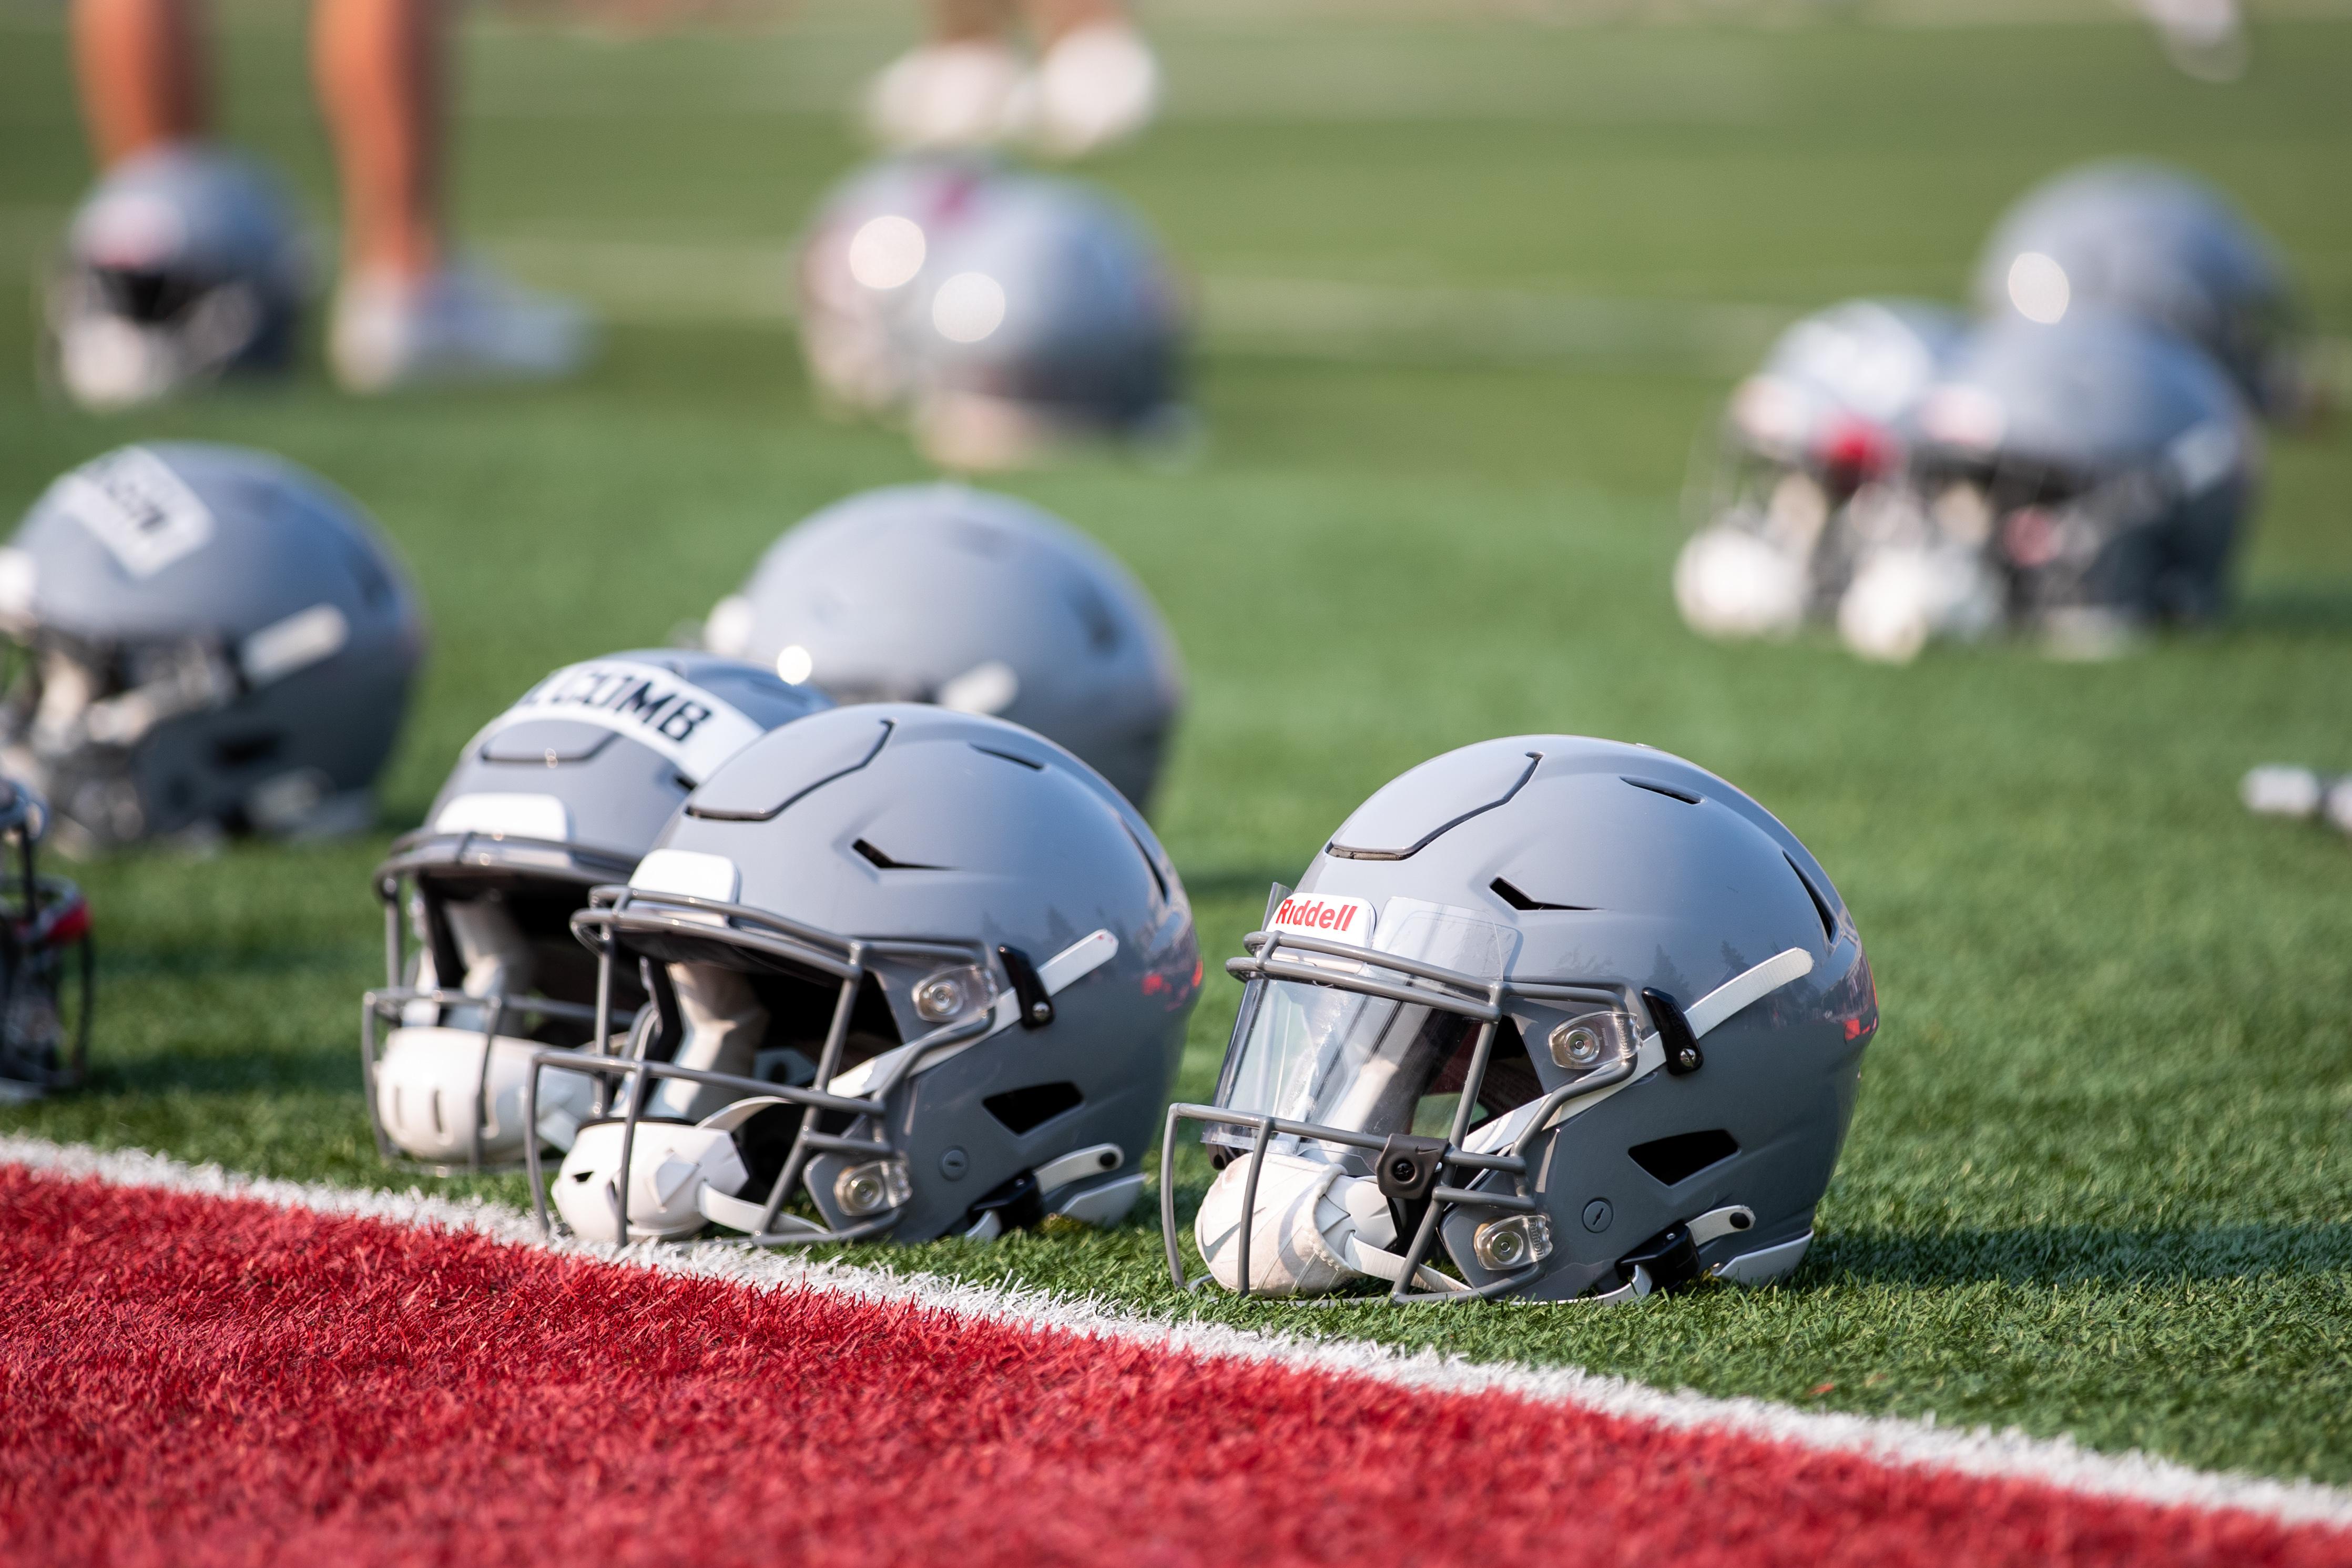 Washington State University Football Fall Practice 6 - Football Helmets